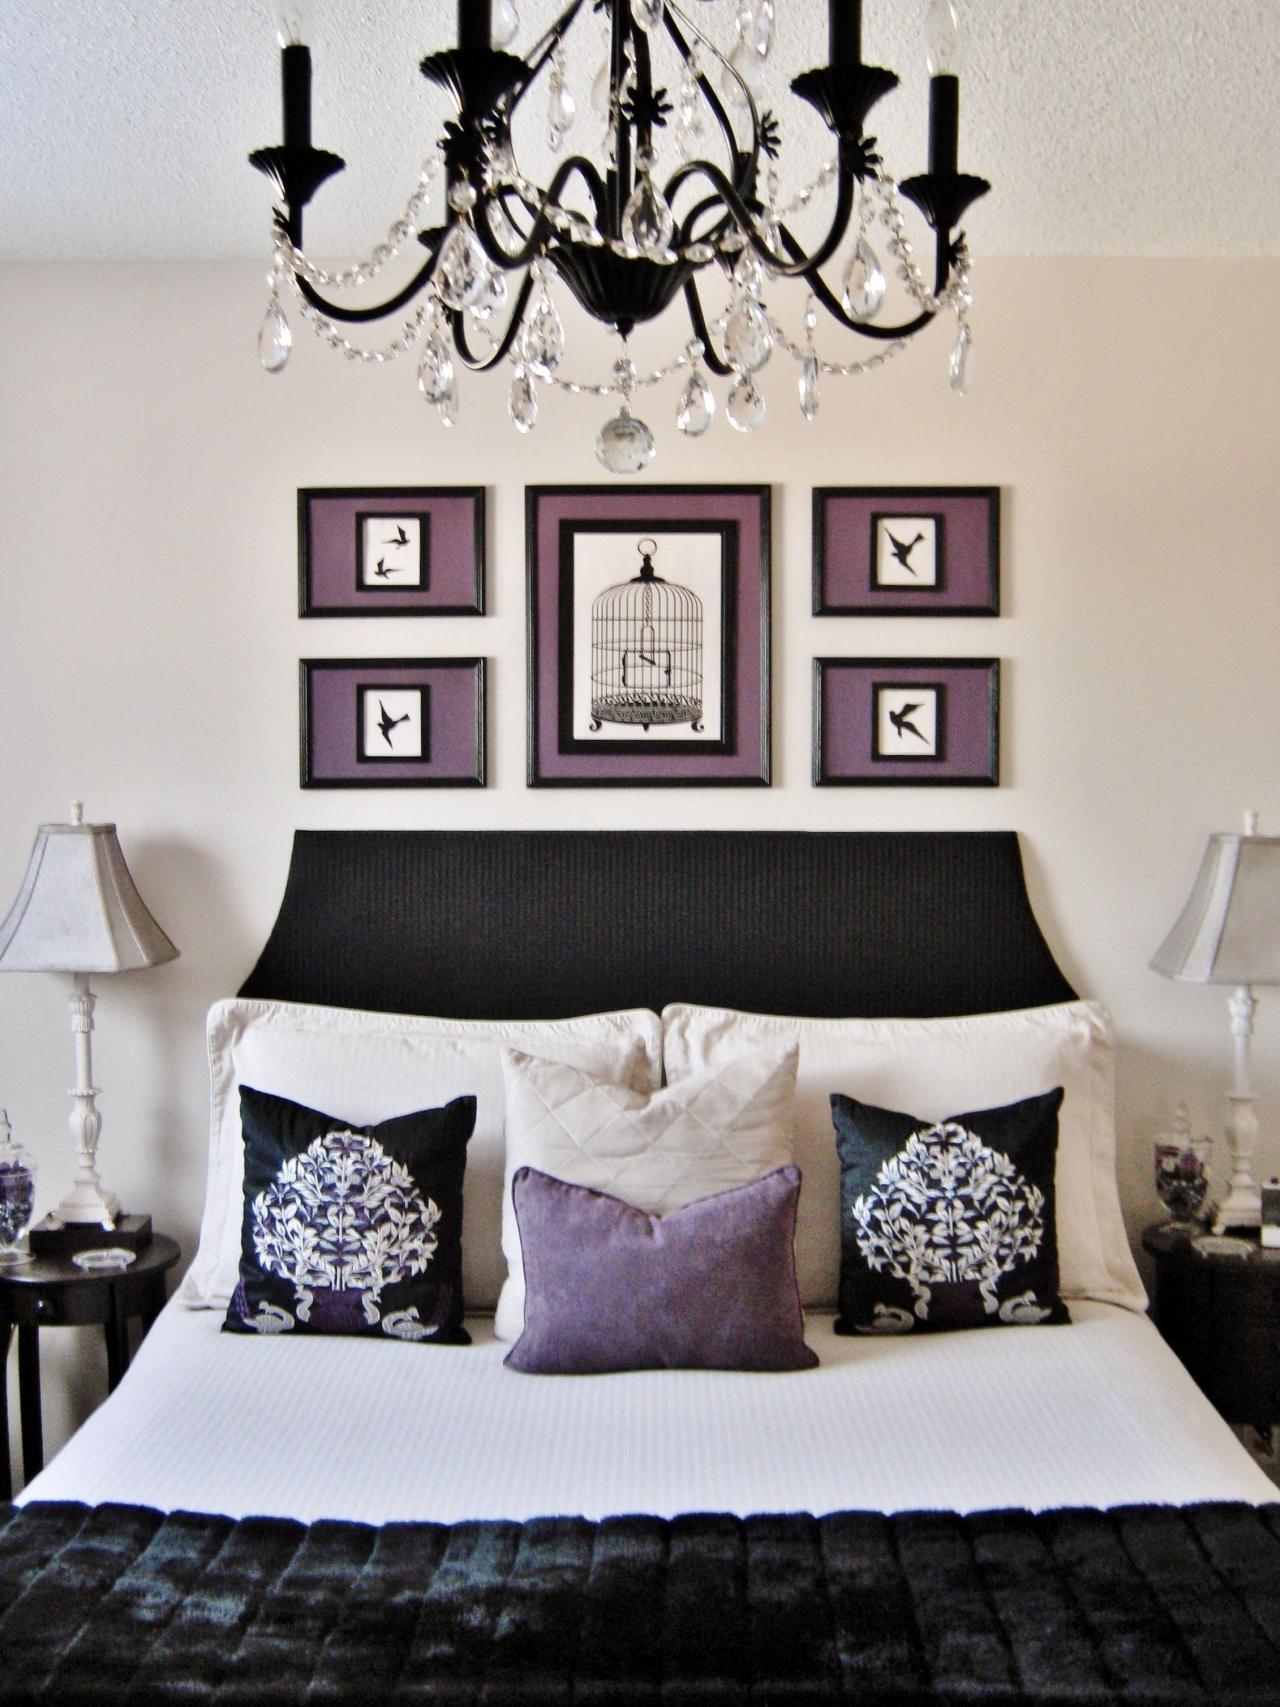 Chandelier Amusing Black Chandelier For Bedroom Decor Black Inside Black Chandelier Bedroom (#8 of 12)